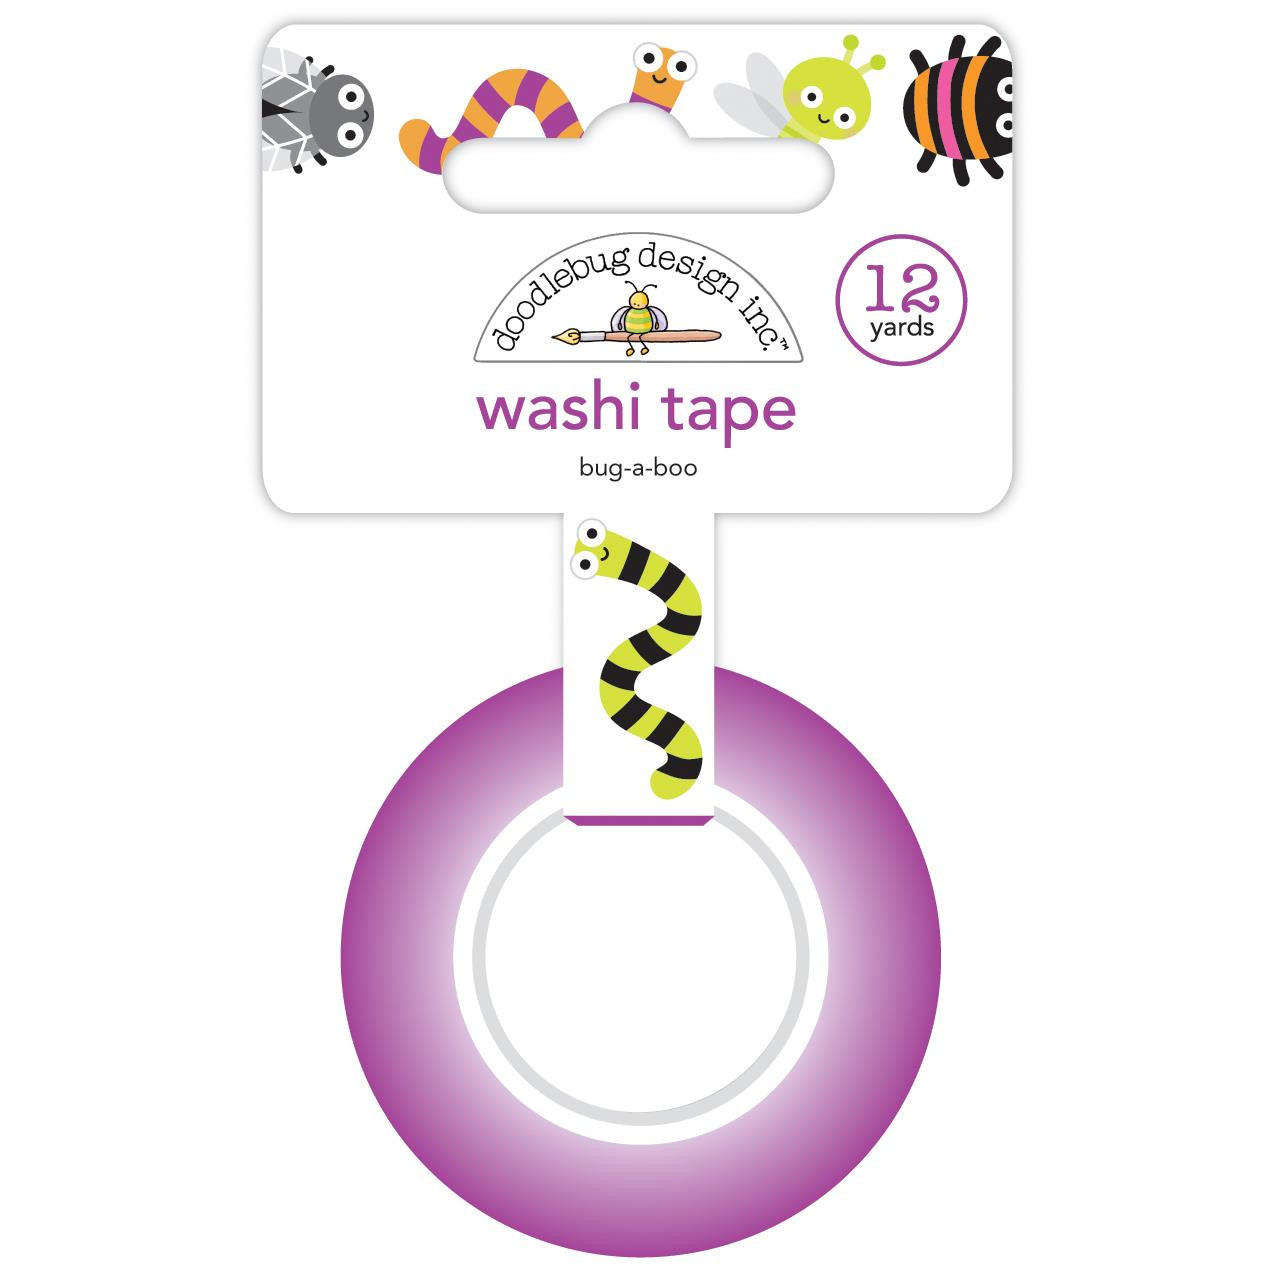 Bug-a-boo, Doodlebug Washi Tape -